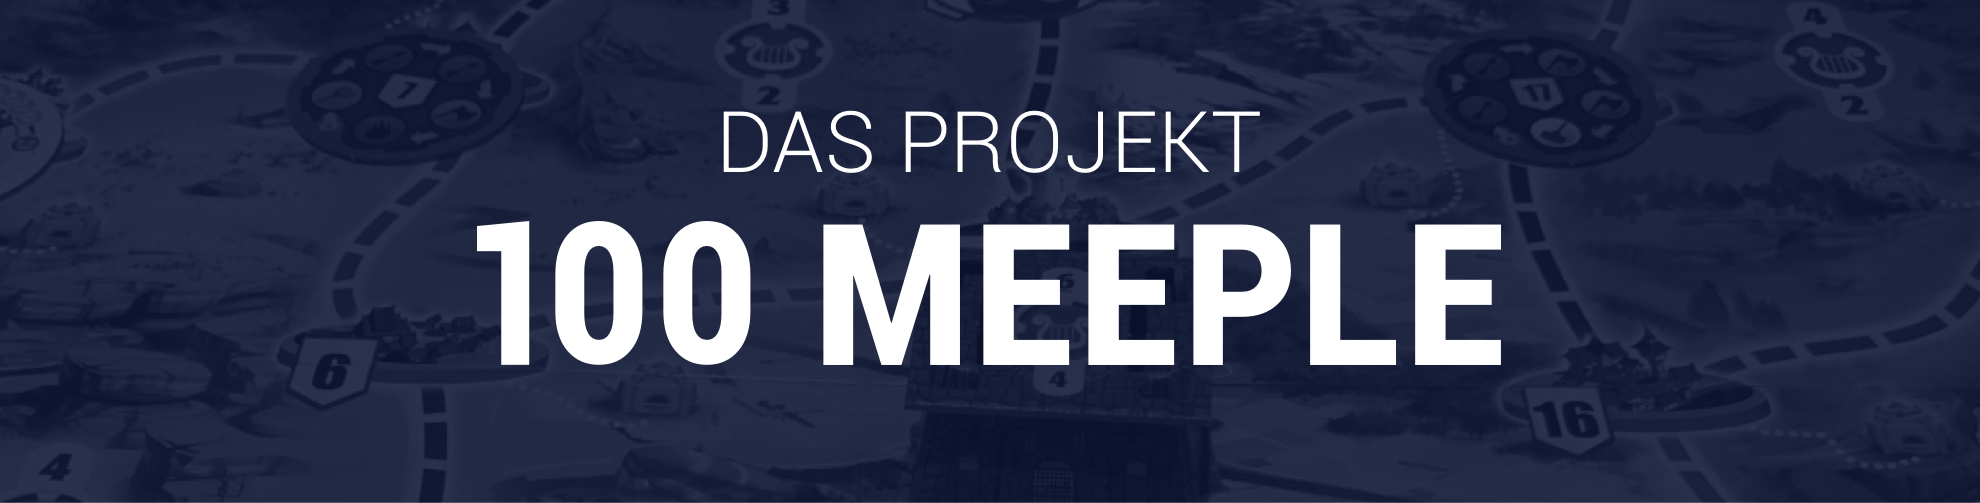 Das 100 Meeple Projekt